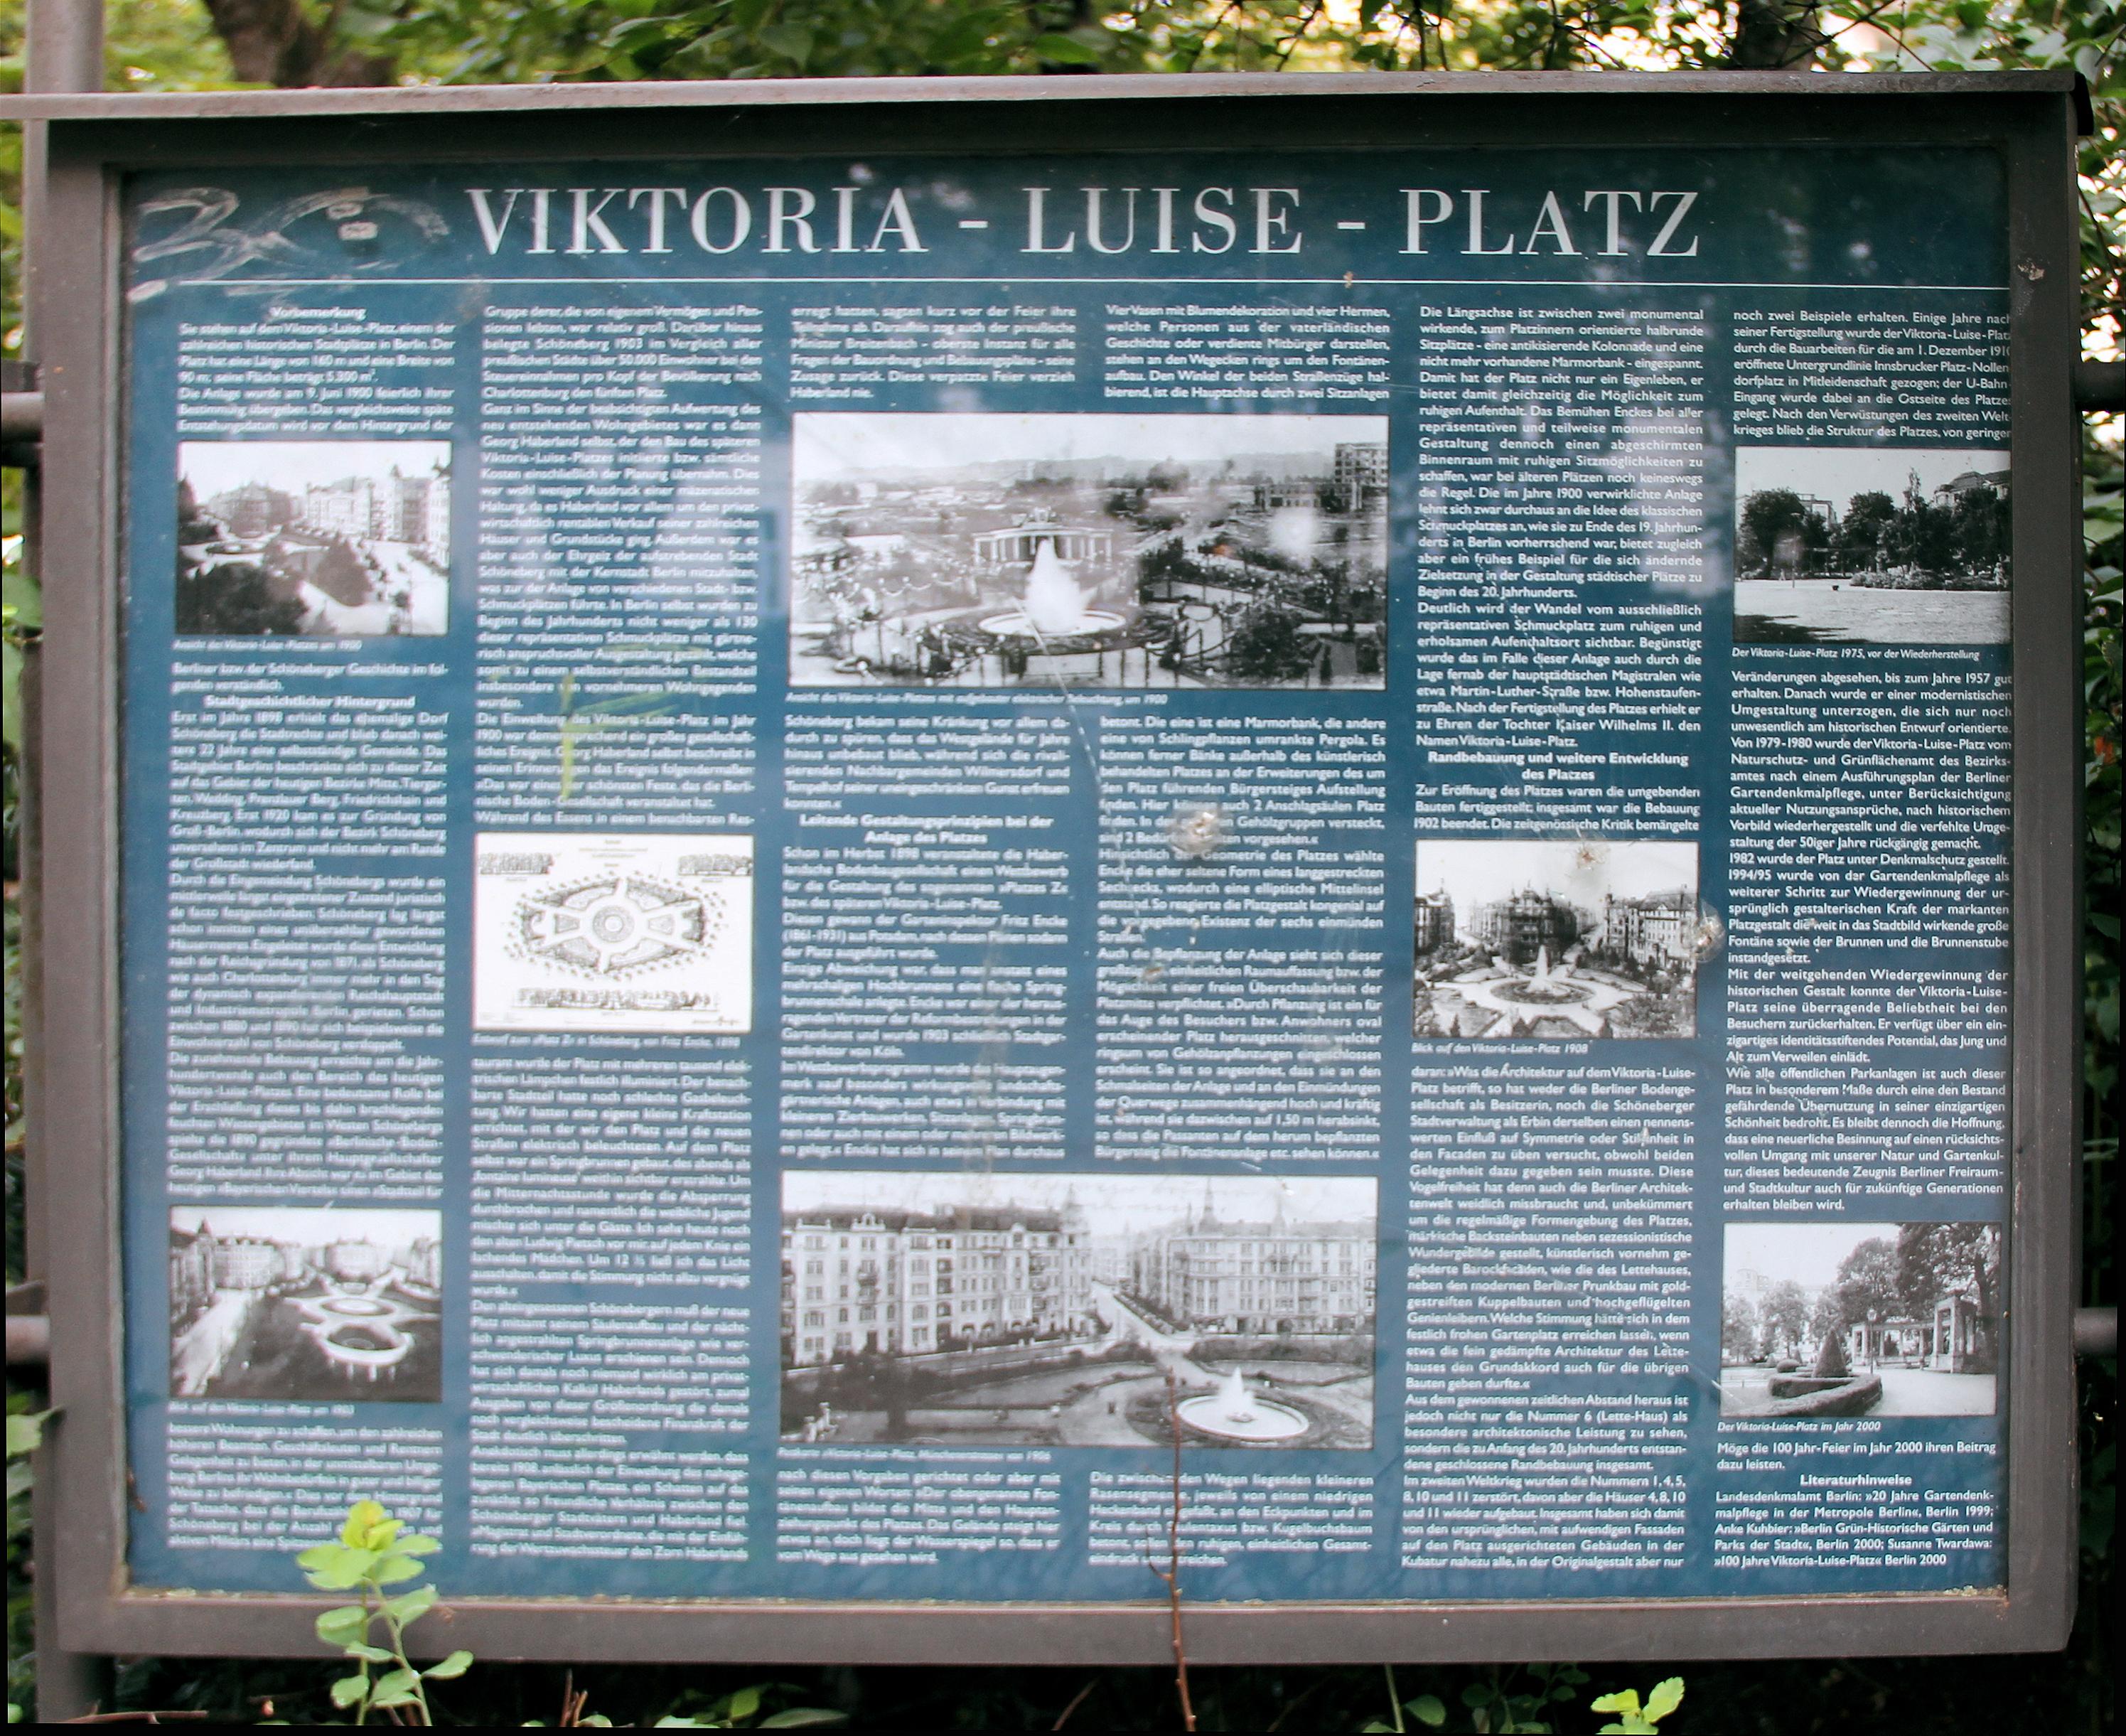 File Gedenktafel Viktoria Luise Platz Schob Viktoria Luise Platz